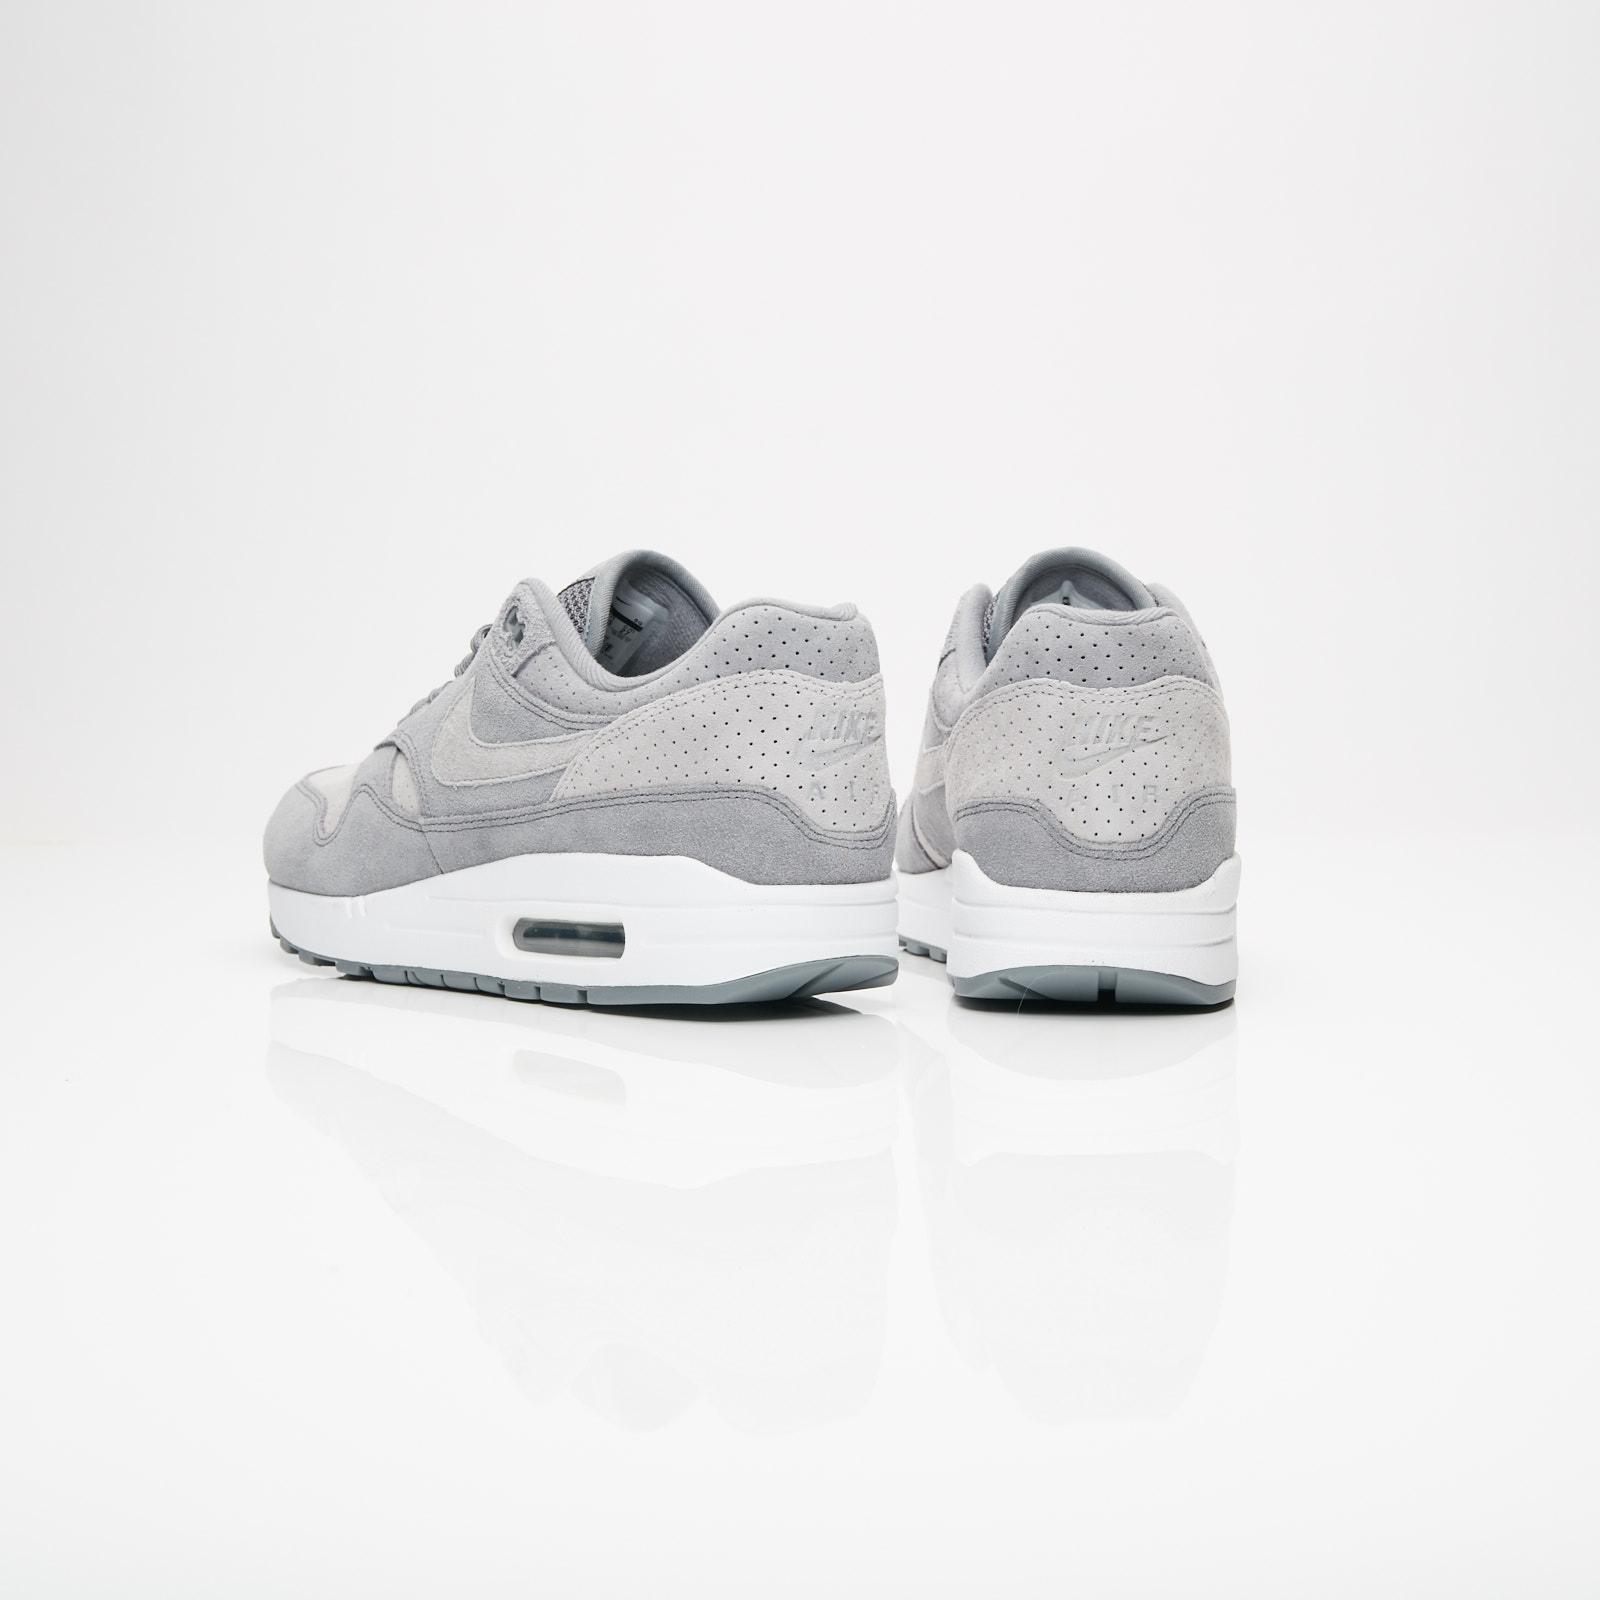 classic fit cd749 3c95e Nike Air Max 1 Premium - 875844-005 - Sneakersnstuff   sneakers    streetwear online since 1999